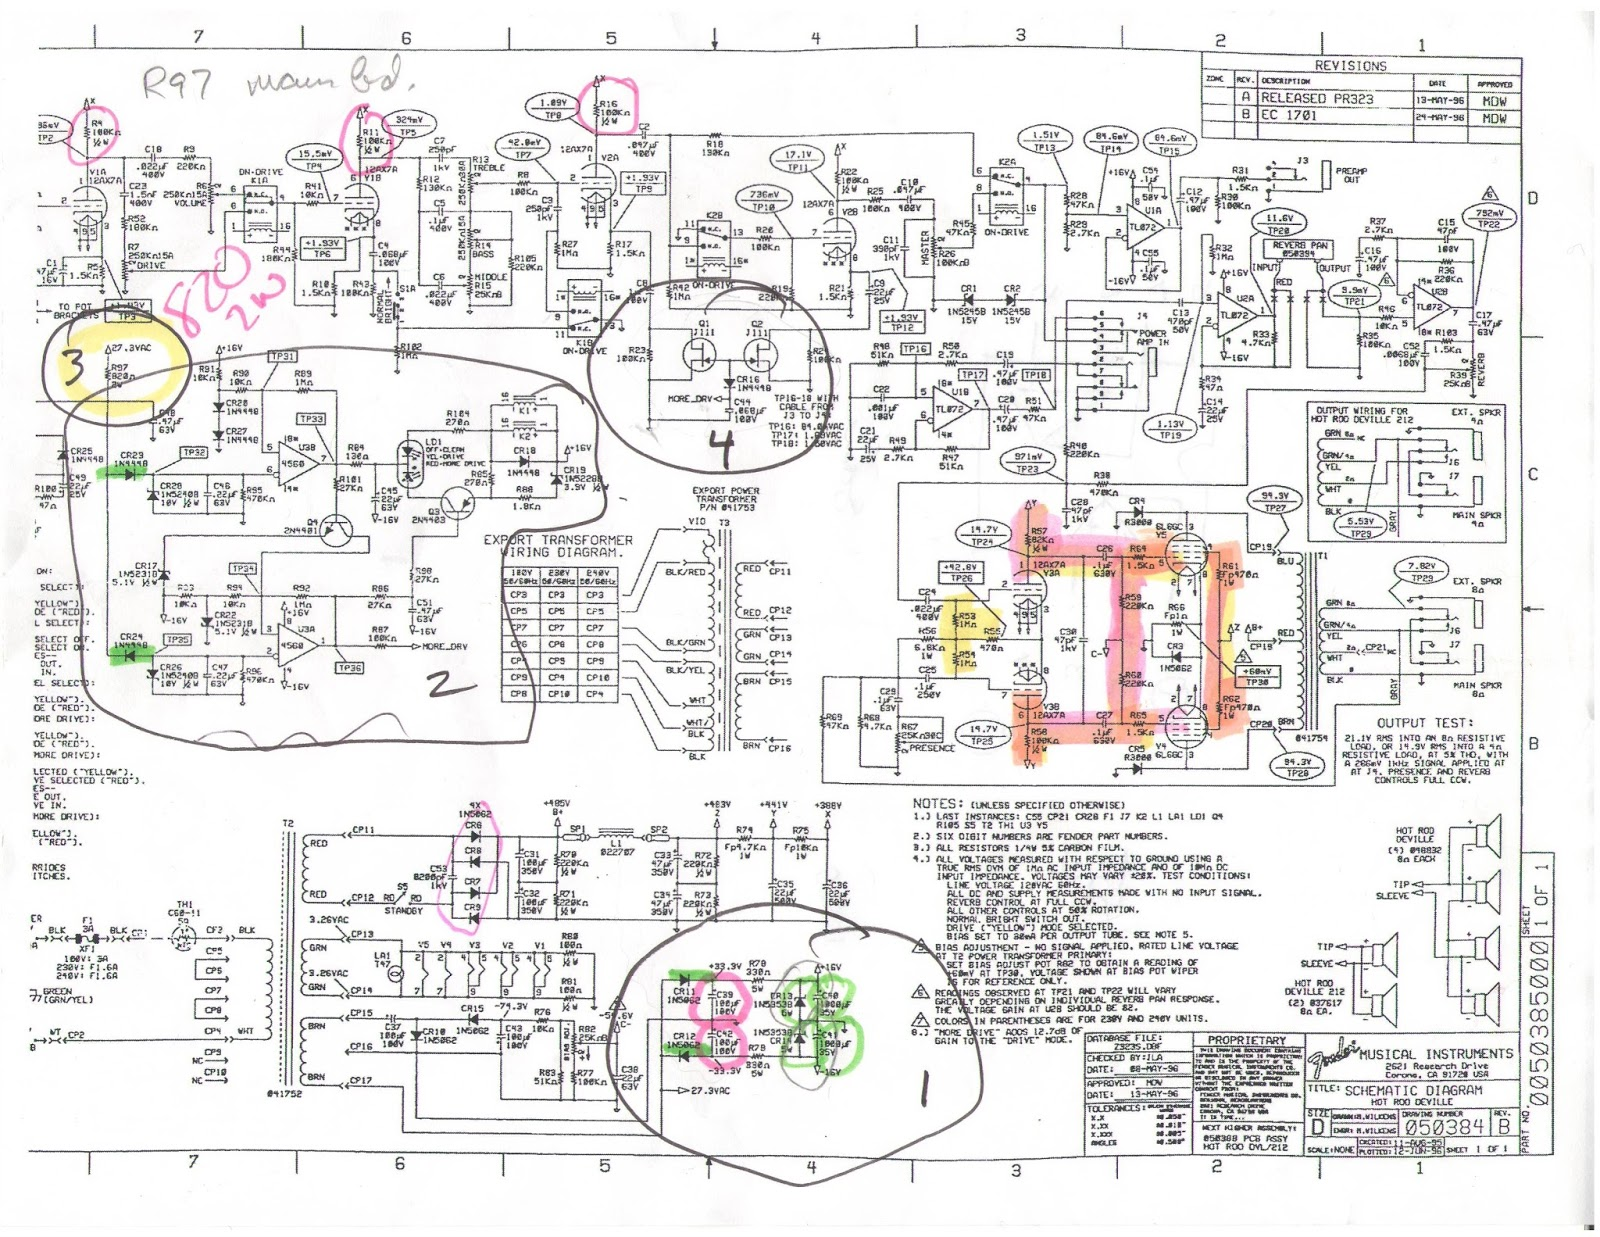 hot rod deville wiring diagram nissan sentra 2001 audio fender library